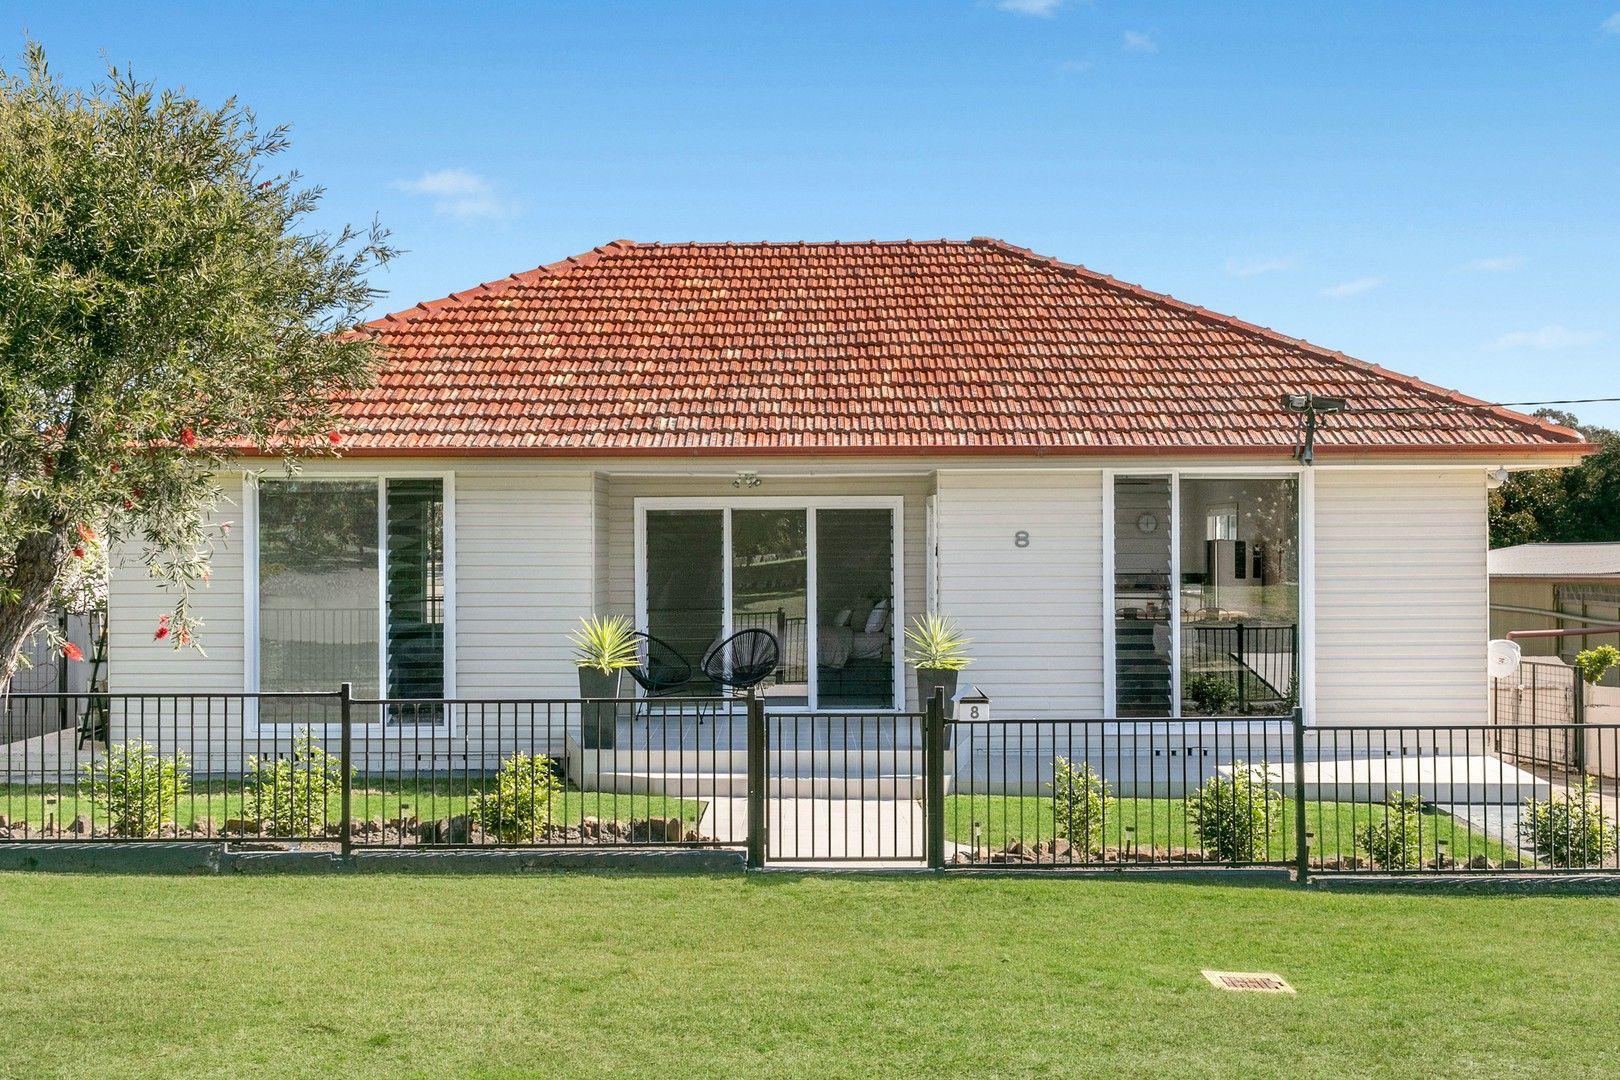 8 Rothbury Street, North Rothbury NSW 2335, Image 0